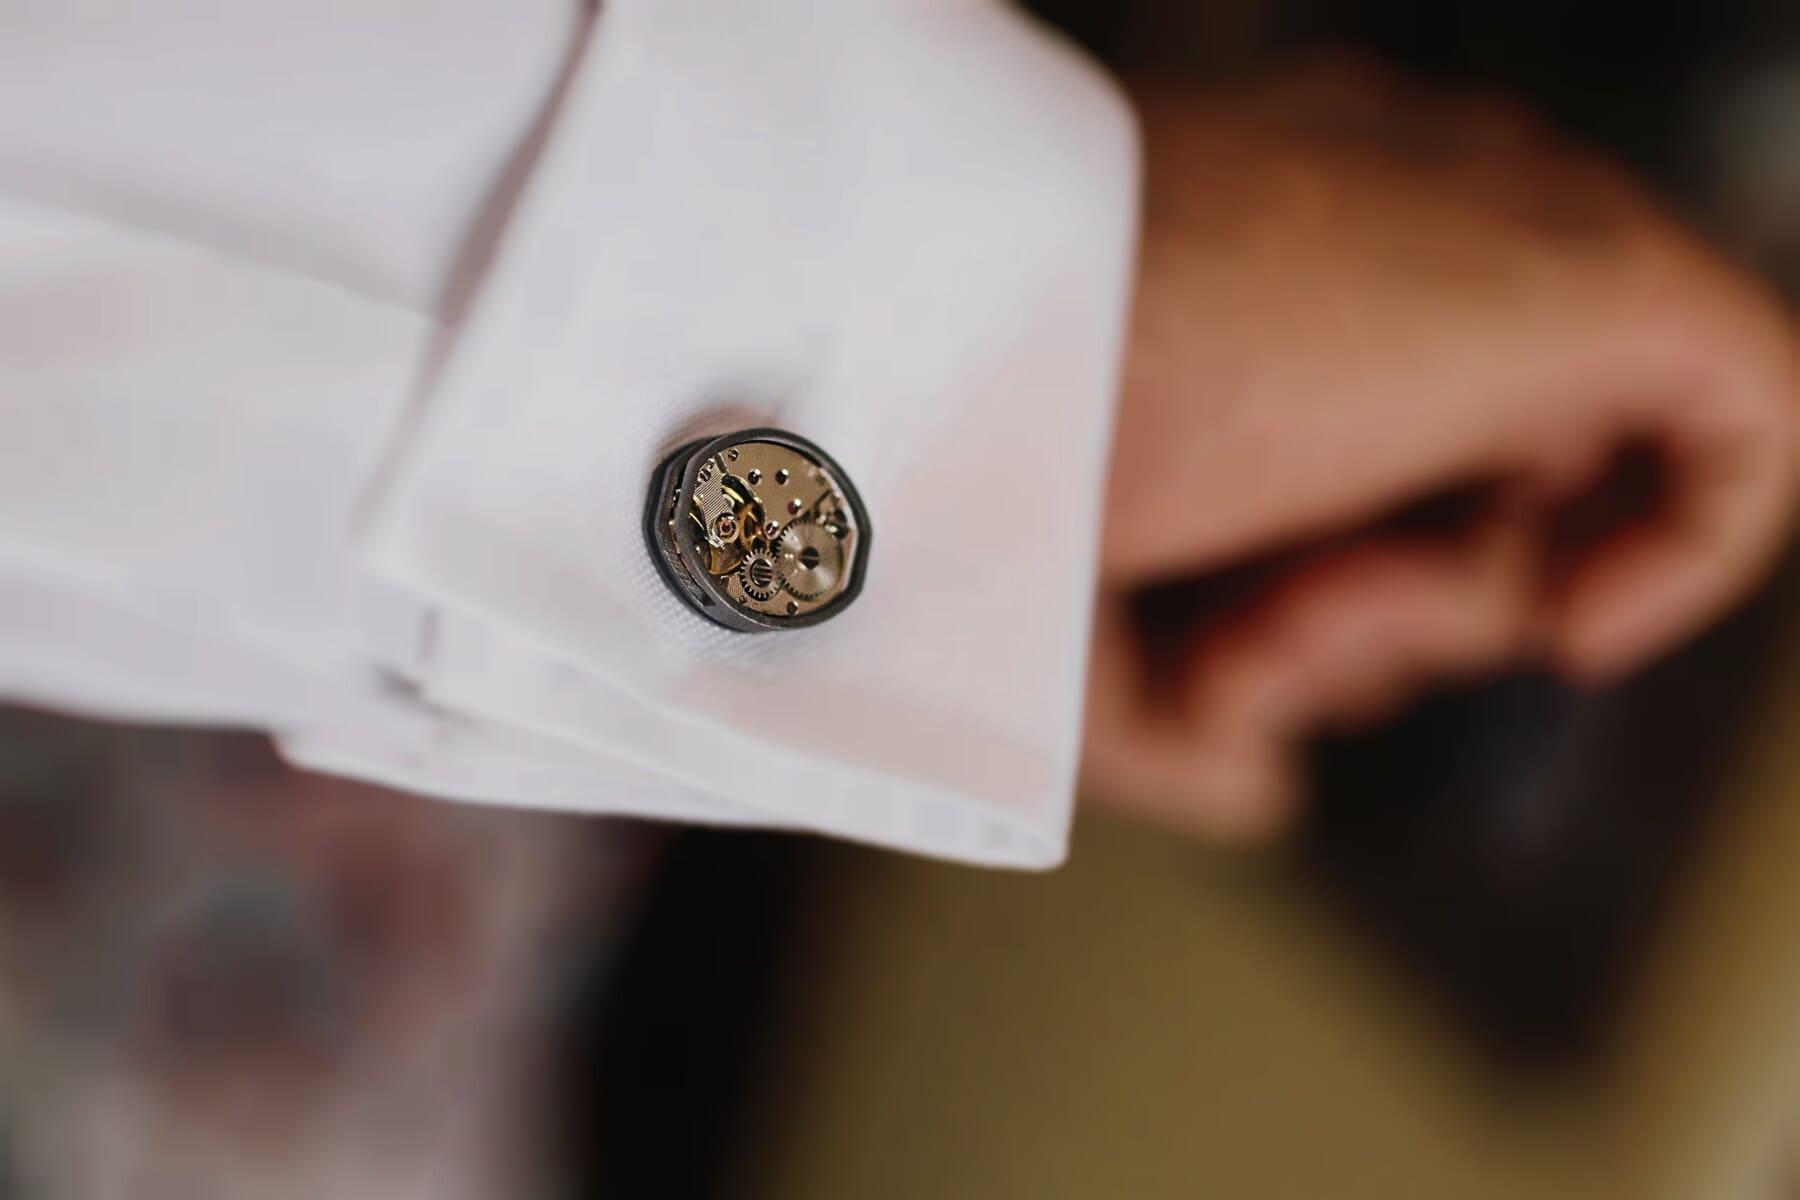 cuff, sleeve, mechanism, details, miniature, analog clock, white, accessory, close-up, hand